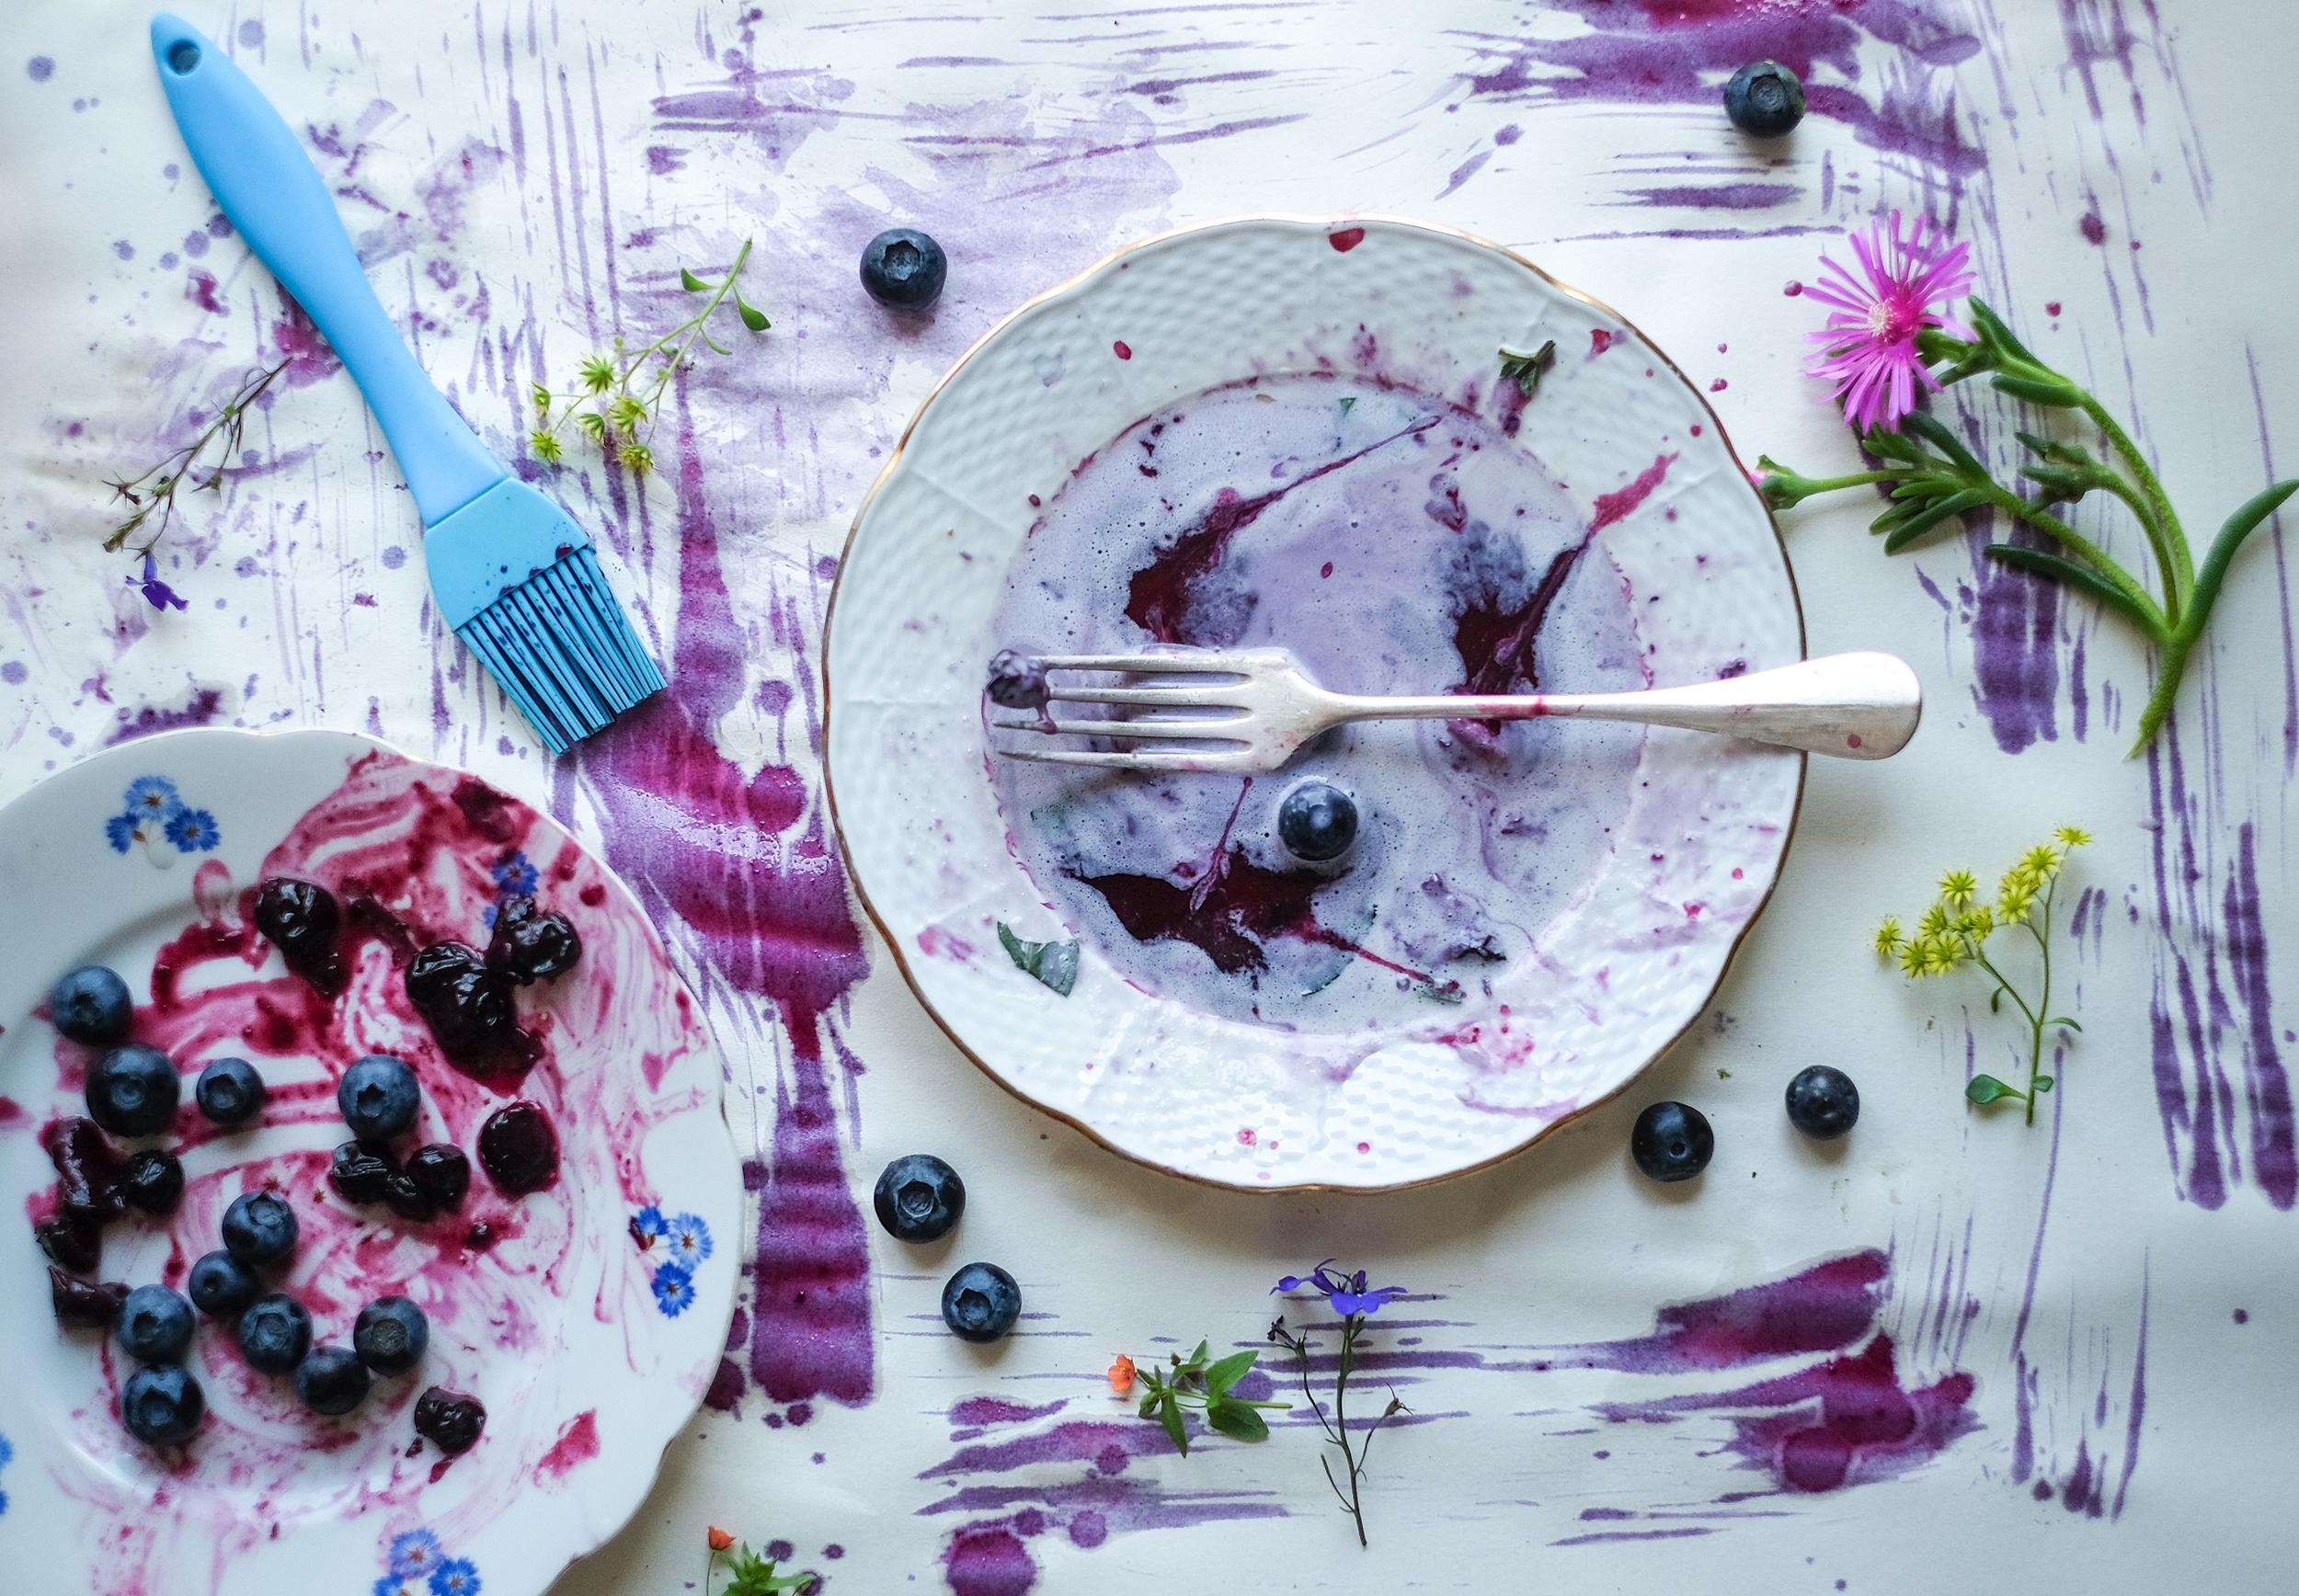 Photoshoot / Foodstyling / Food is Art - Art is Food